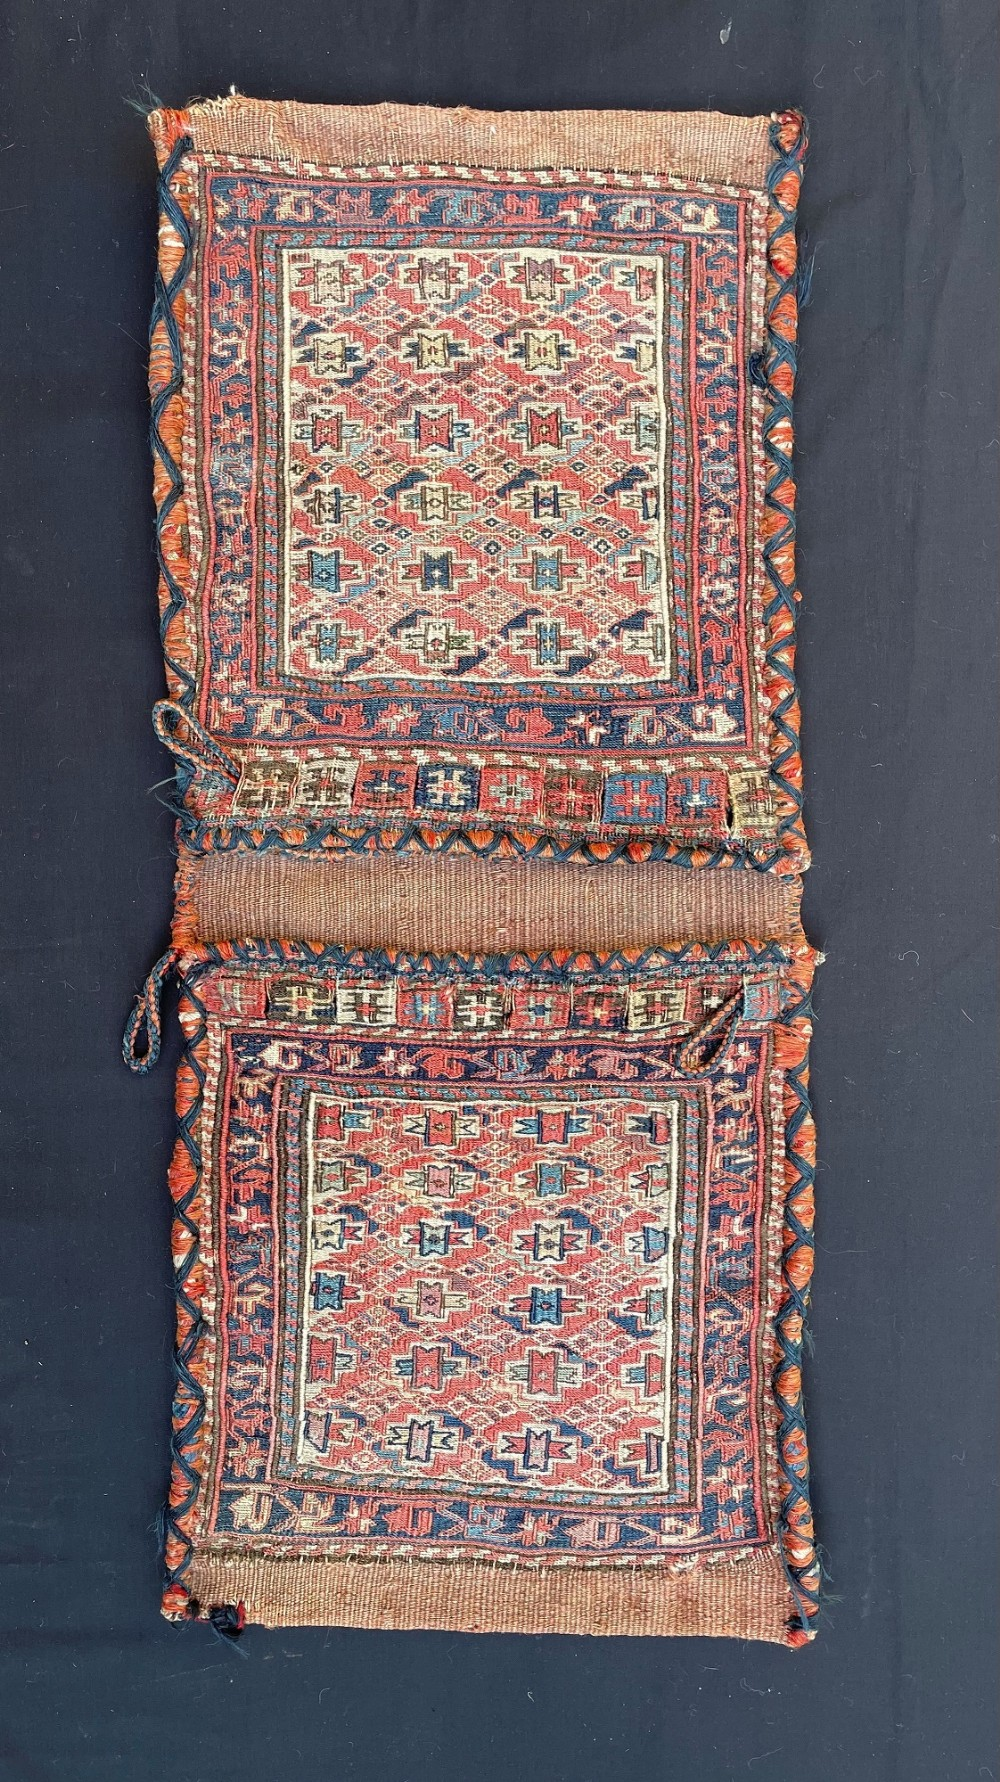 antique khorjin saddlebags shahsevan nomads of qeydar northwest persia